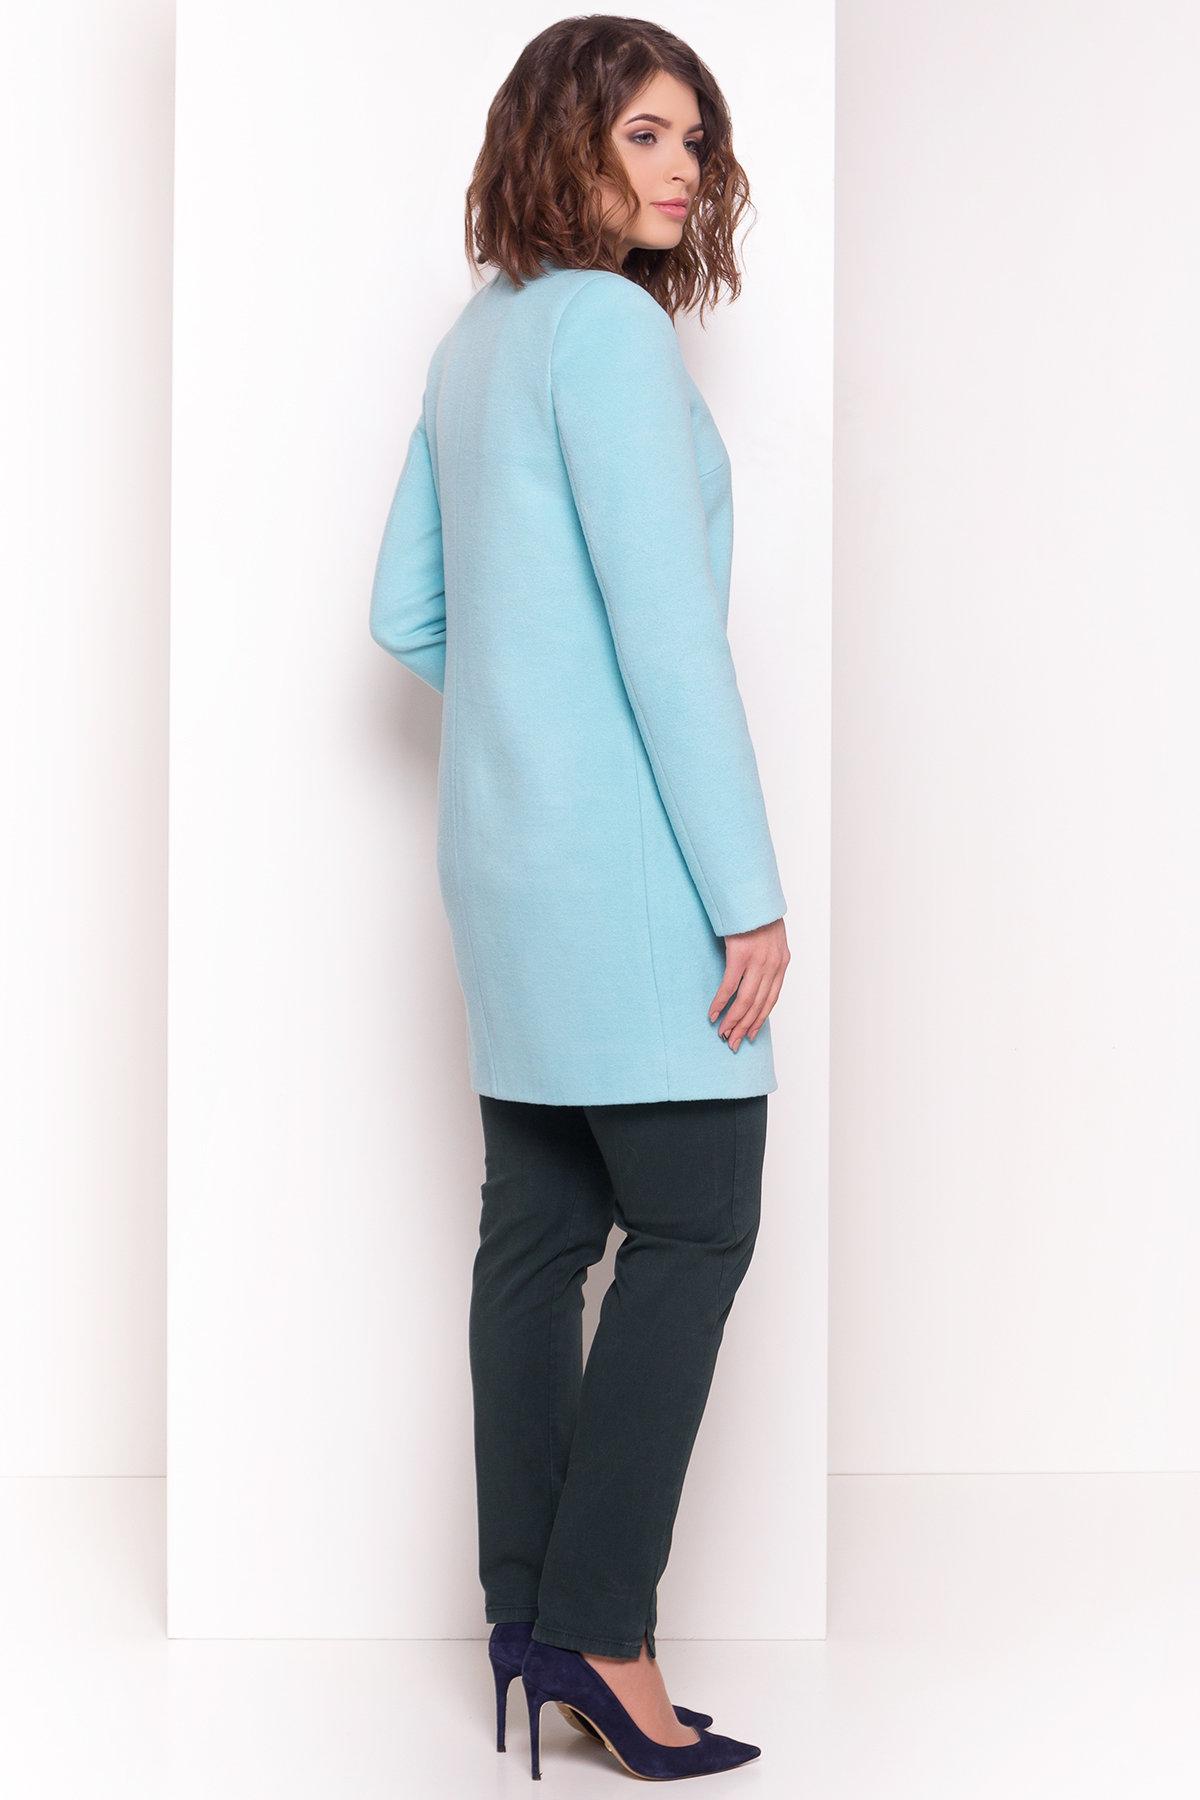 Пальто Фортуна 4812 АРТ. 34120 Цвет: Мята - фото 3, интернет магазин tm-modus.ru